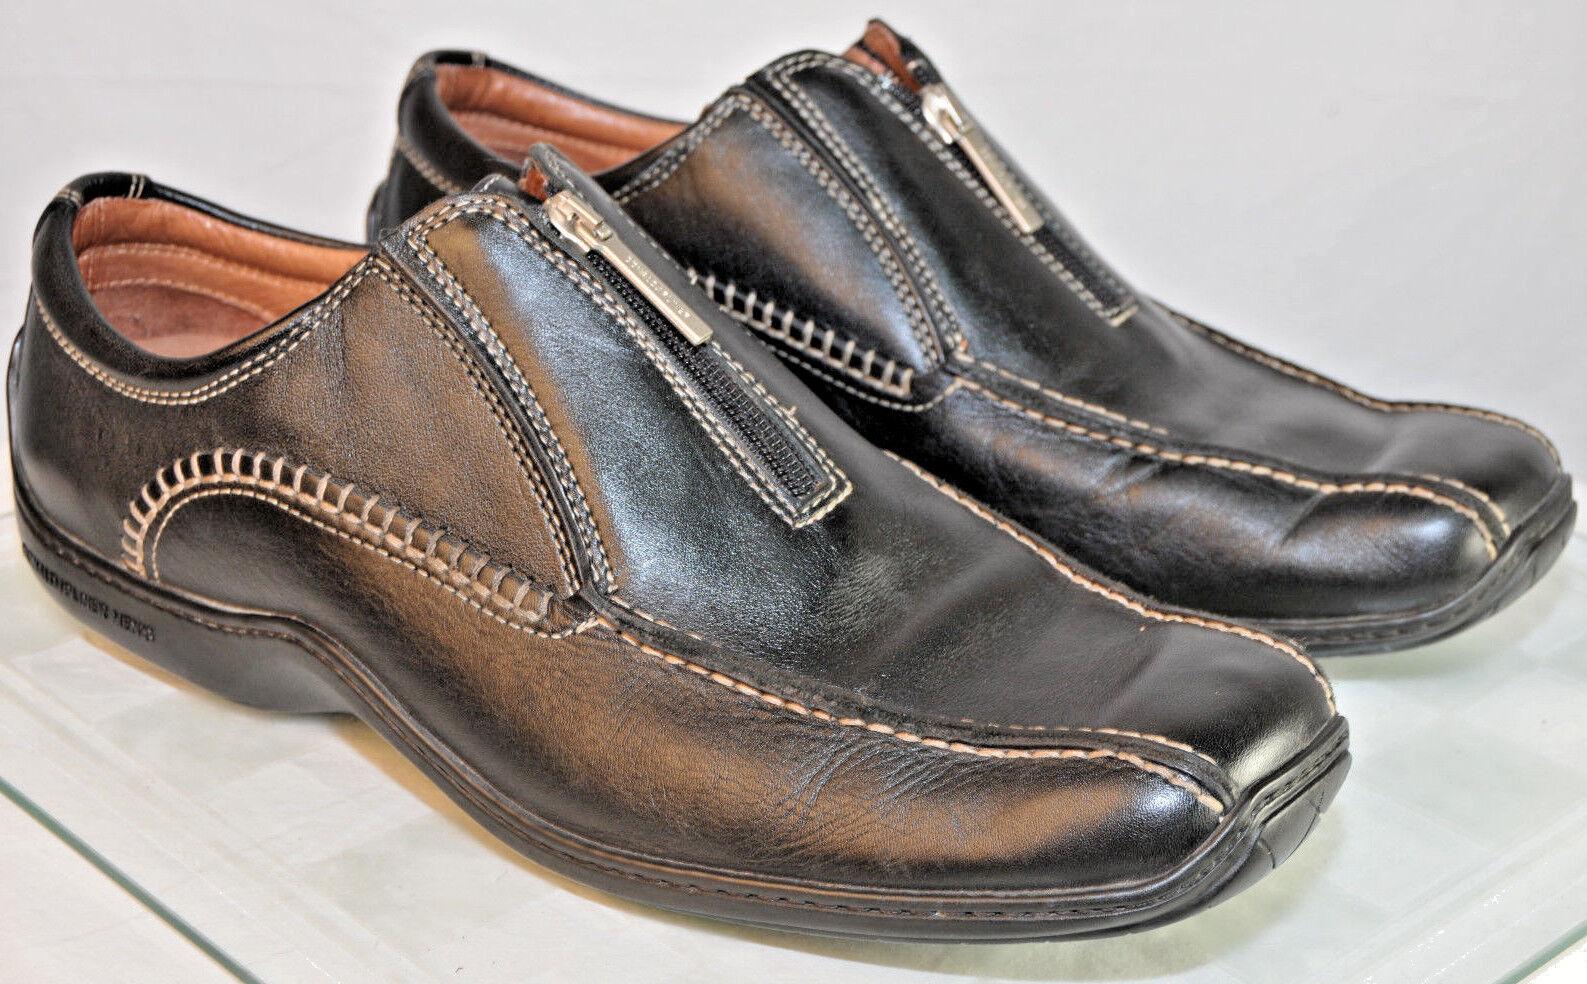 f341f97843 DONALD J Black Ernie Driving Moccasin Loafer Men 10.5 M Top Bike Toe Zip  PLINER nrkusq1656-new shoes